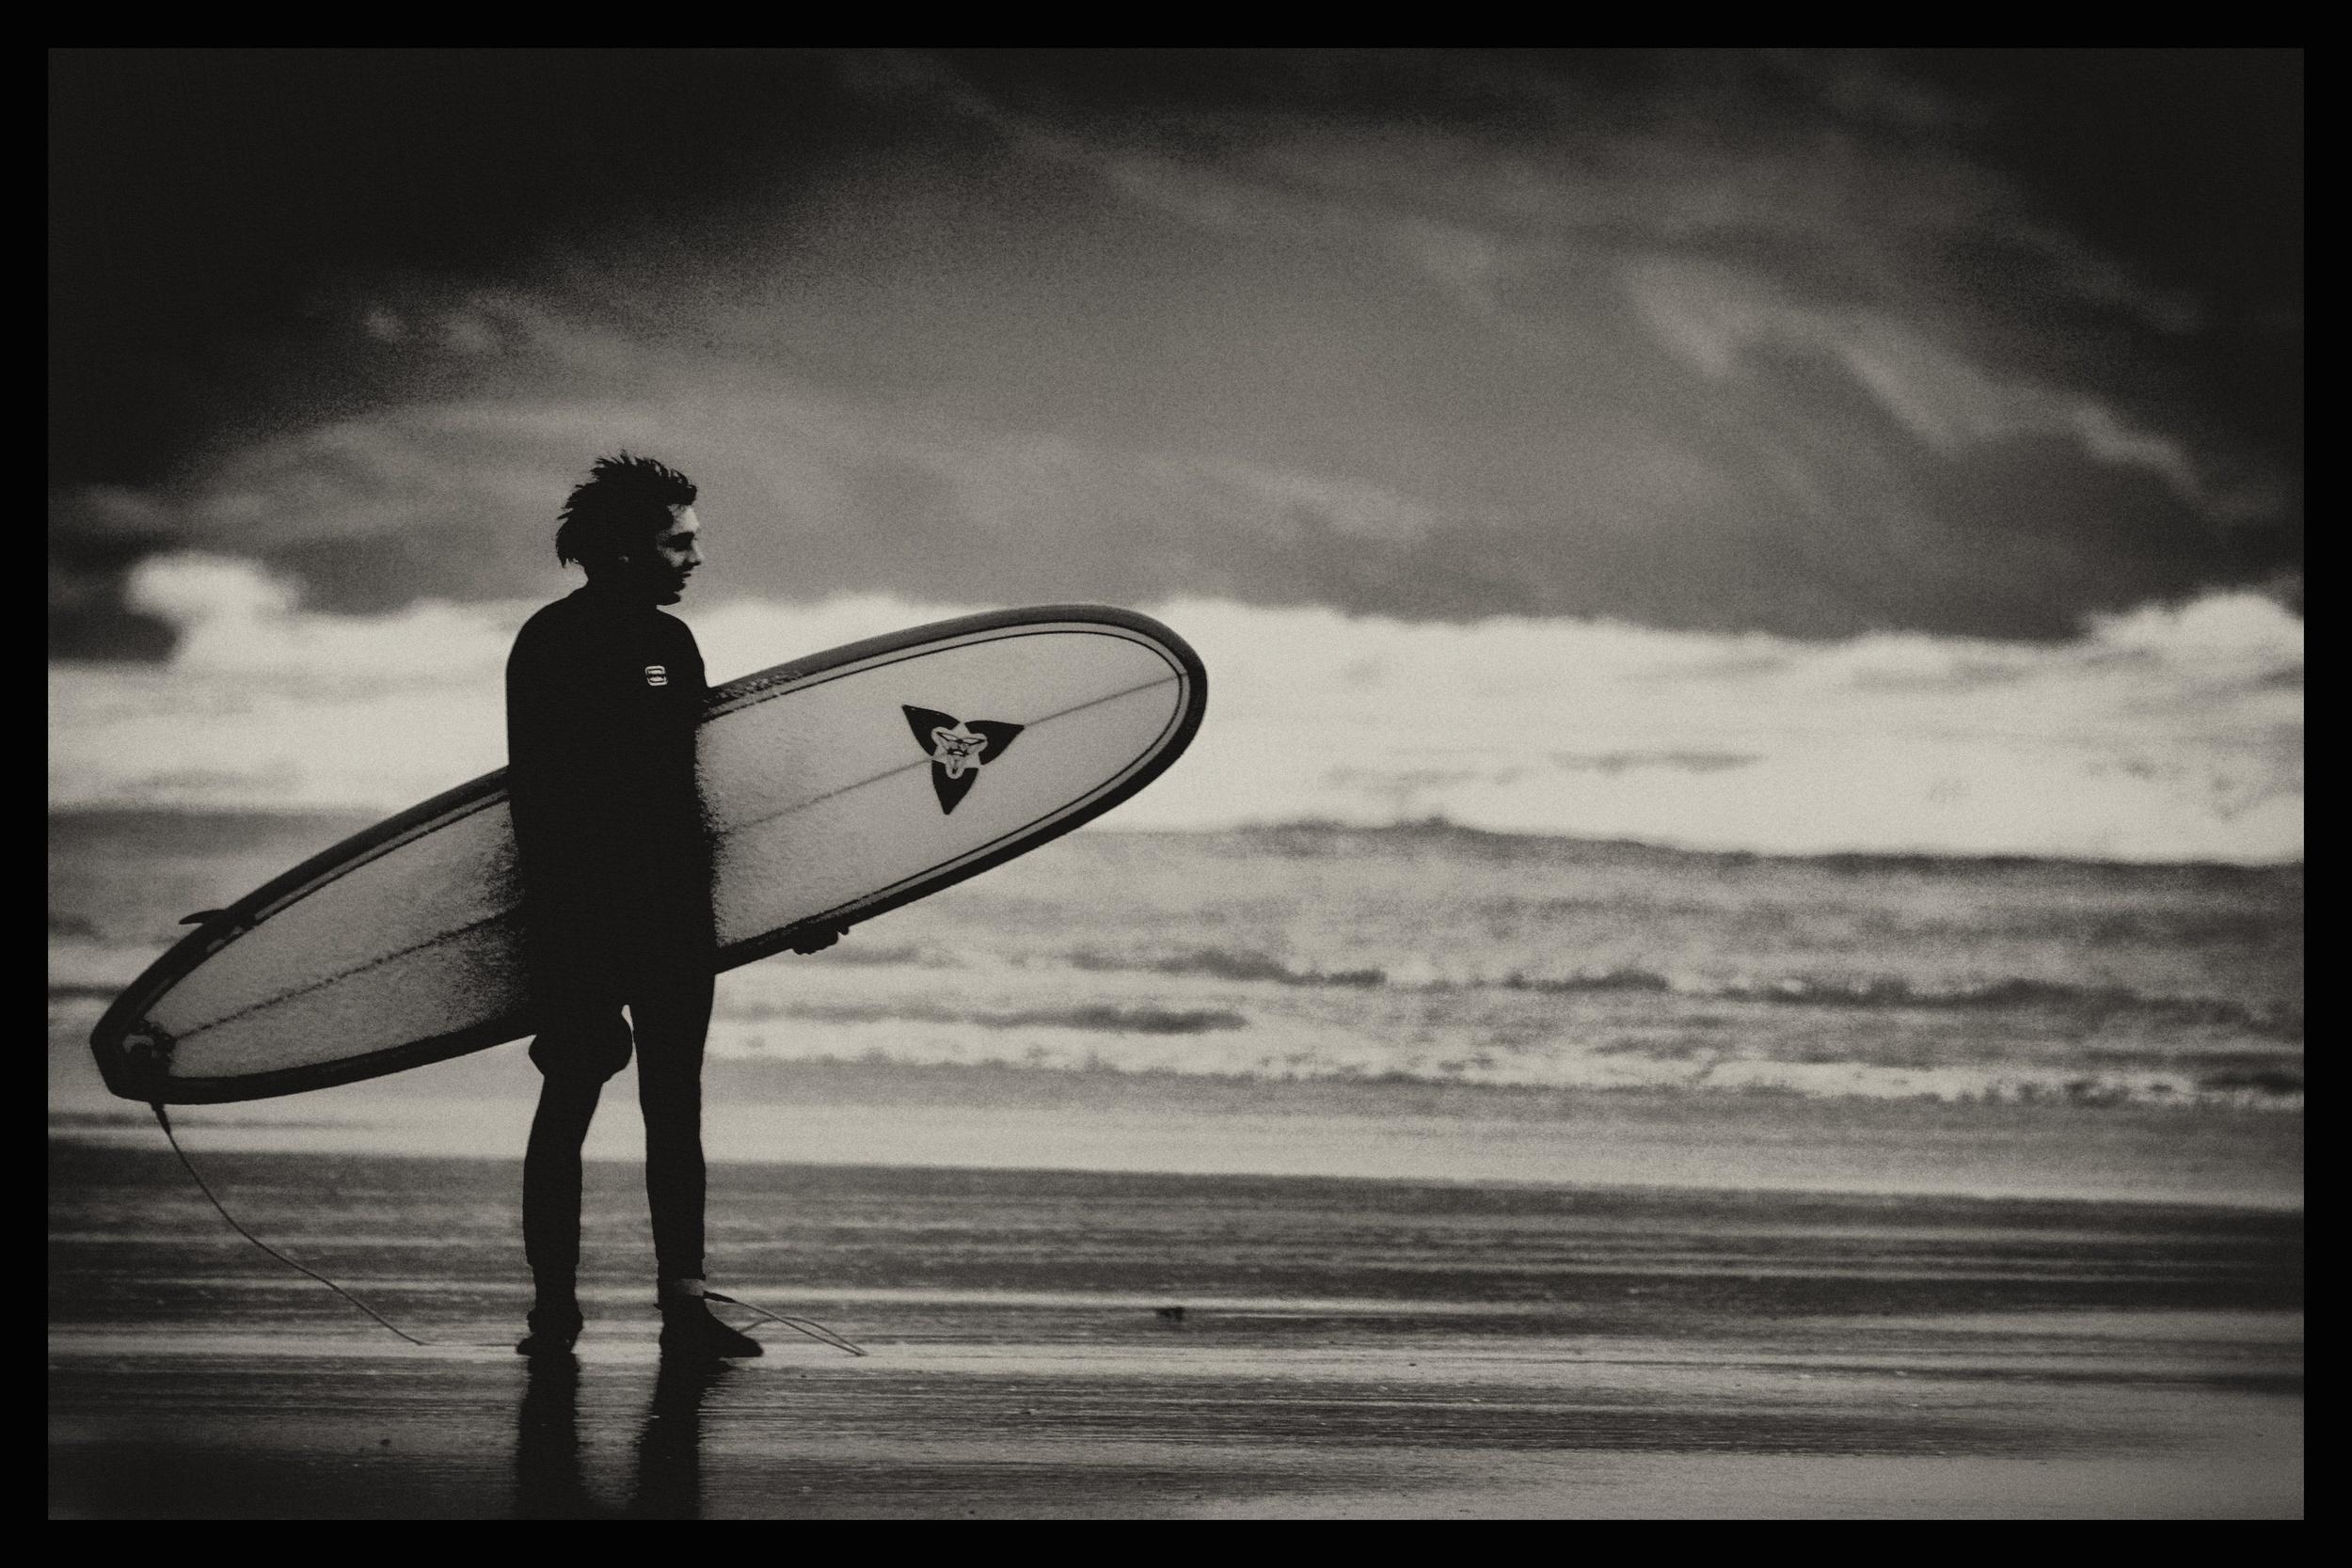 Wayne Hudson Photography, Lucria Creative, Cornwall and Devon photographer,  Launceston, photography / personal portrait / boudoir / art nude / studio / location / portrait / Surf / Imagery by Hudson